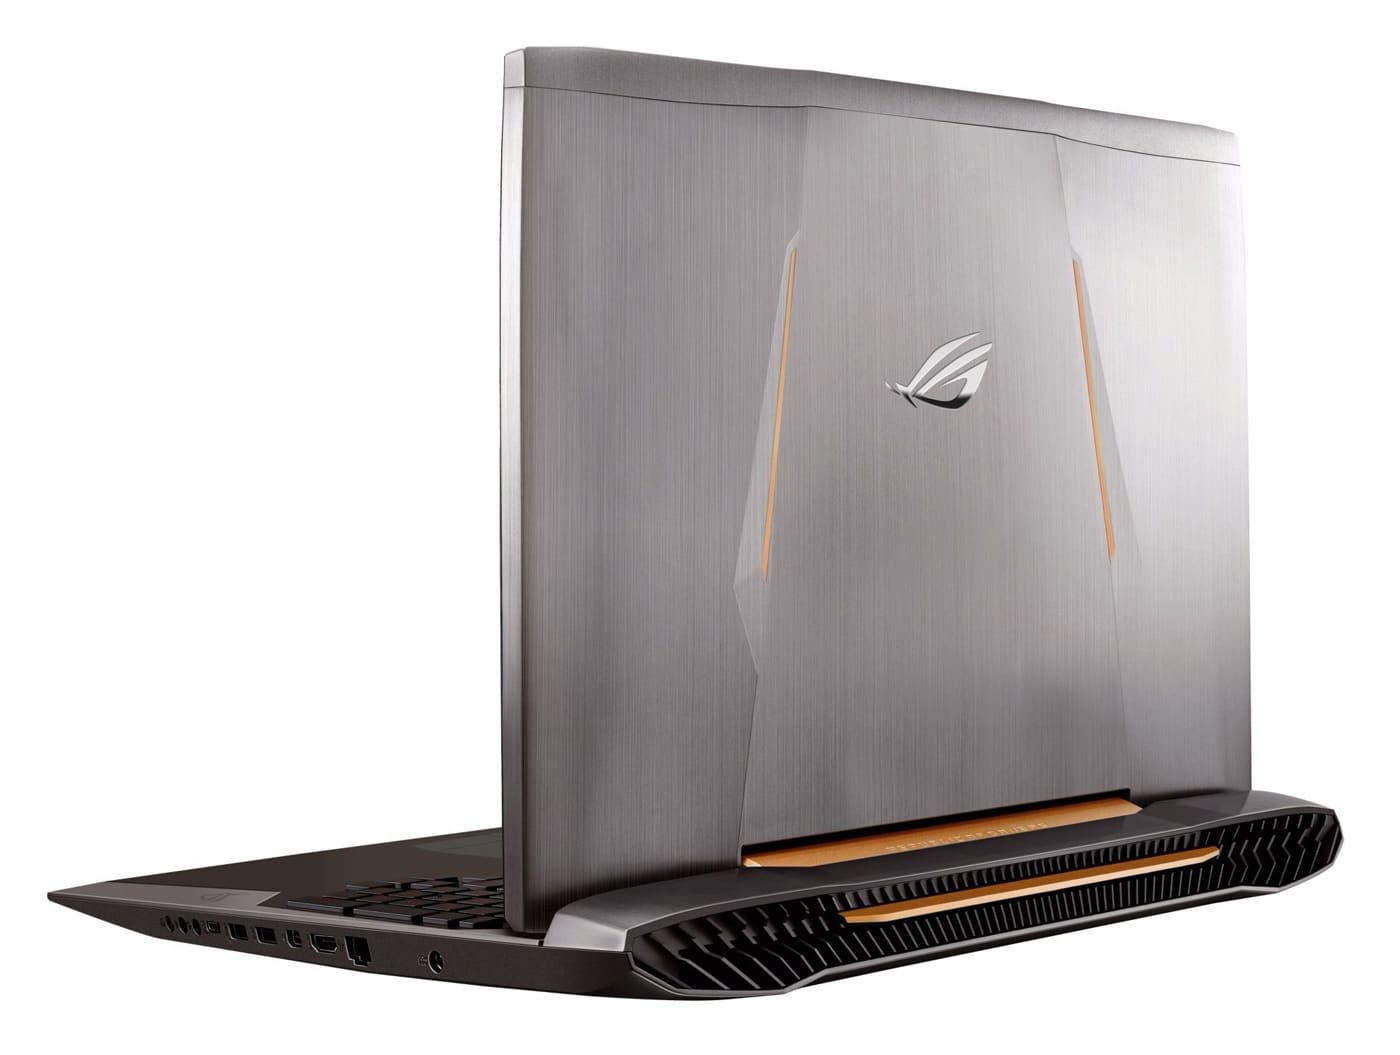 Asus G752VM-GC020T, PC portable 17 pouces GTX 1060 SSD i7 promo 1799€